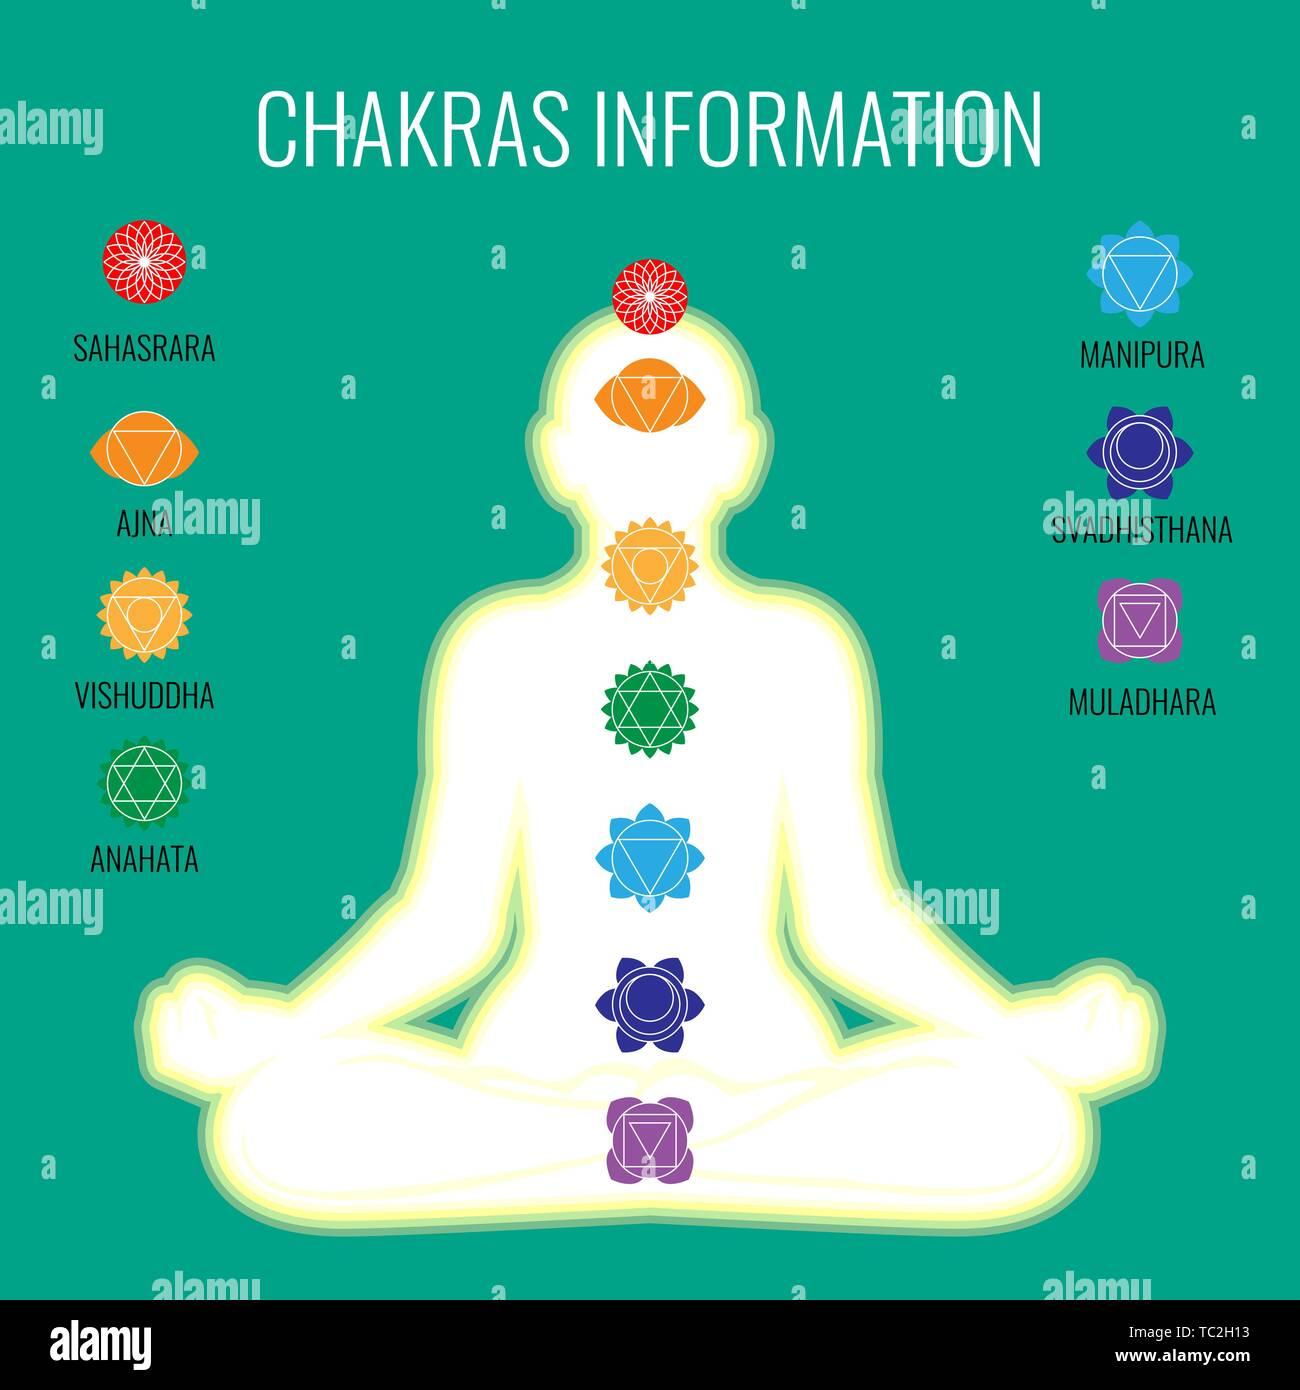 Chakras Human Body Stock Photos & Chakras Human Body Stock